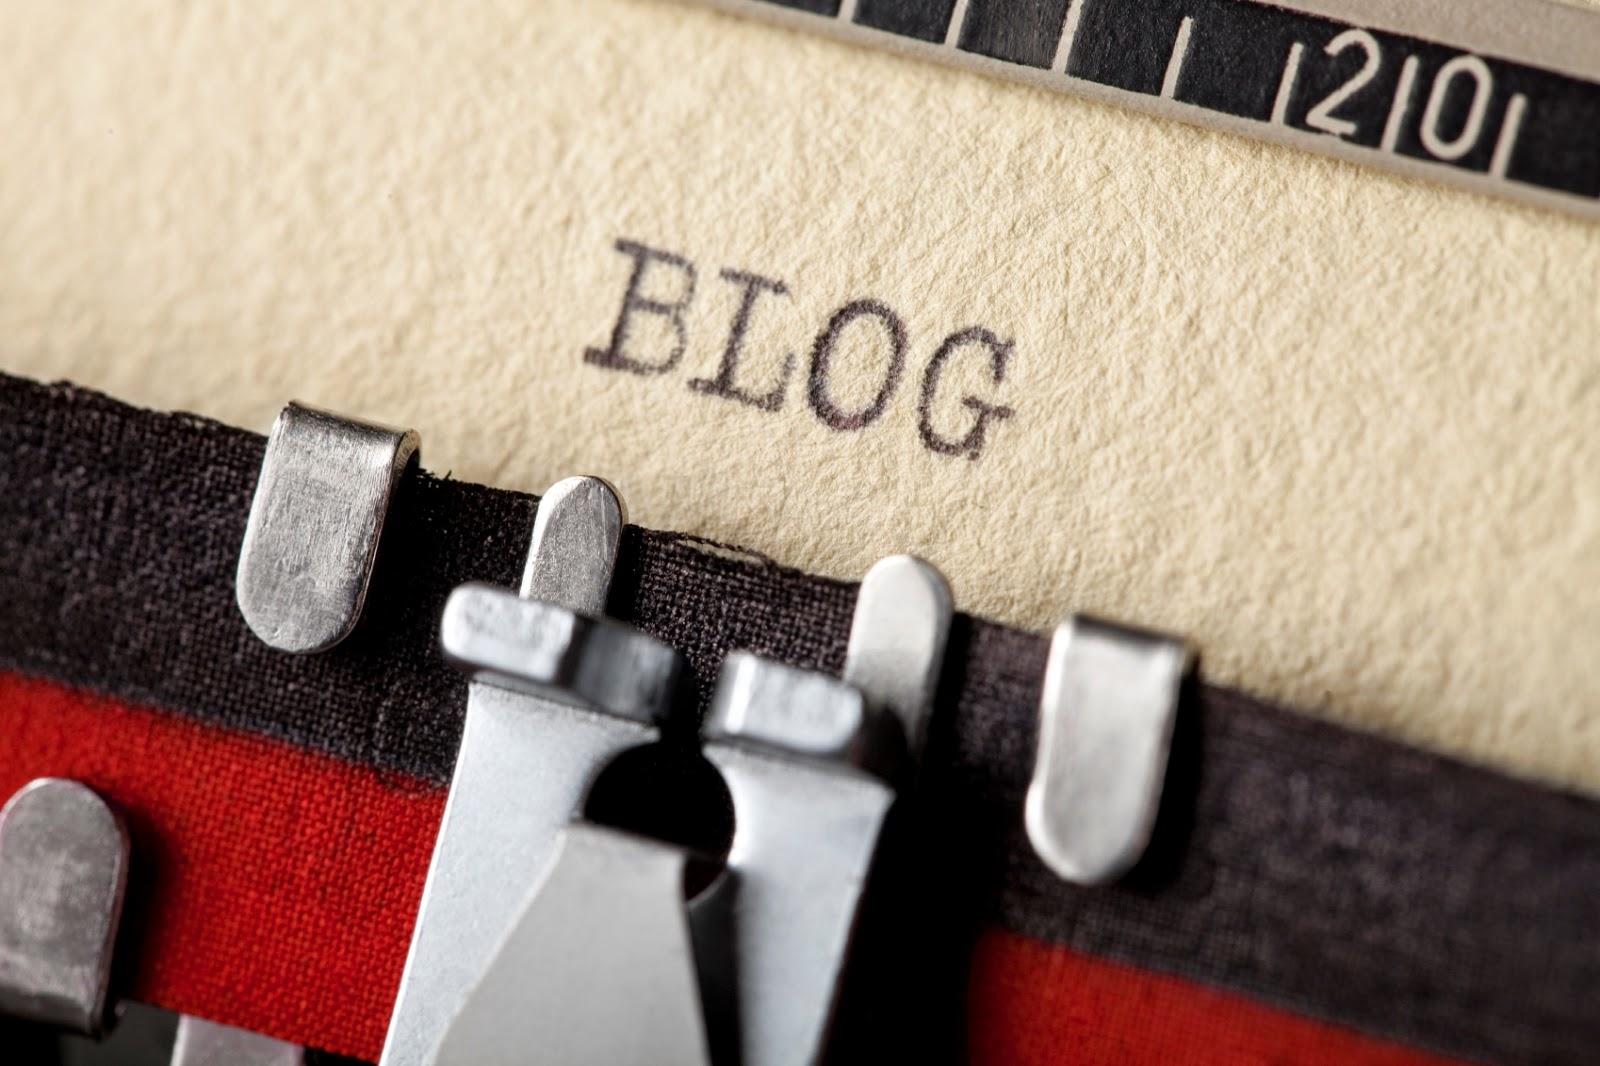 kitab seo, teknik seo merah jambu, malaysia best blog, malaysia best blog 2015, buat duit online, blogger malaysia, teknik seo 2015, susu kambing segar, best blog malaysia, contest seo 2015